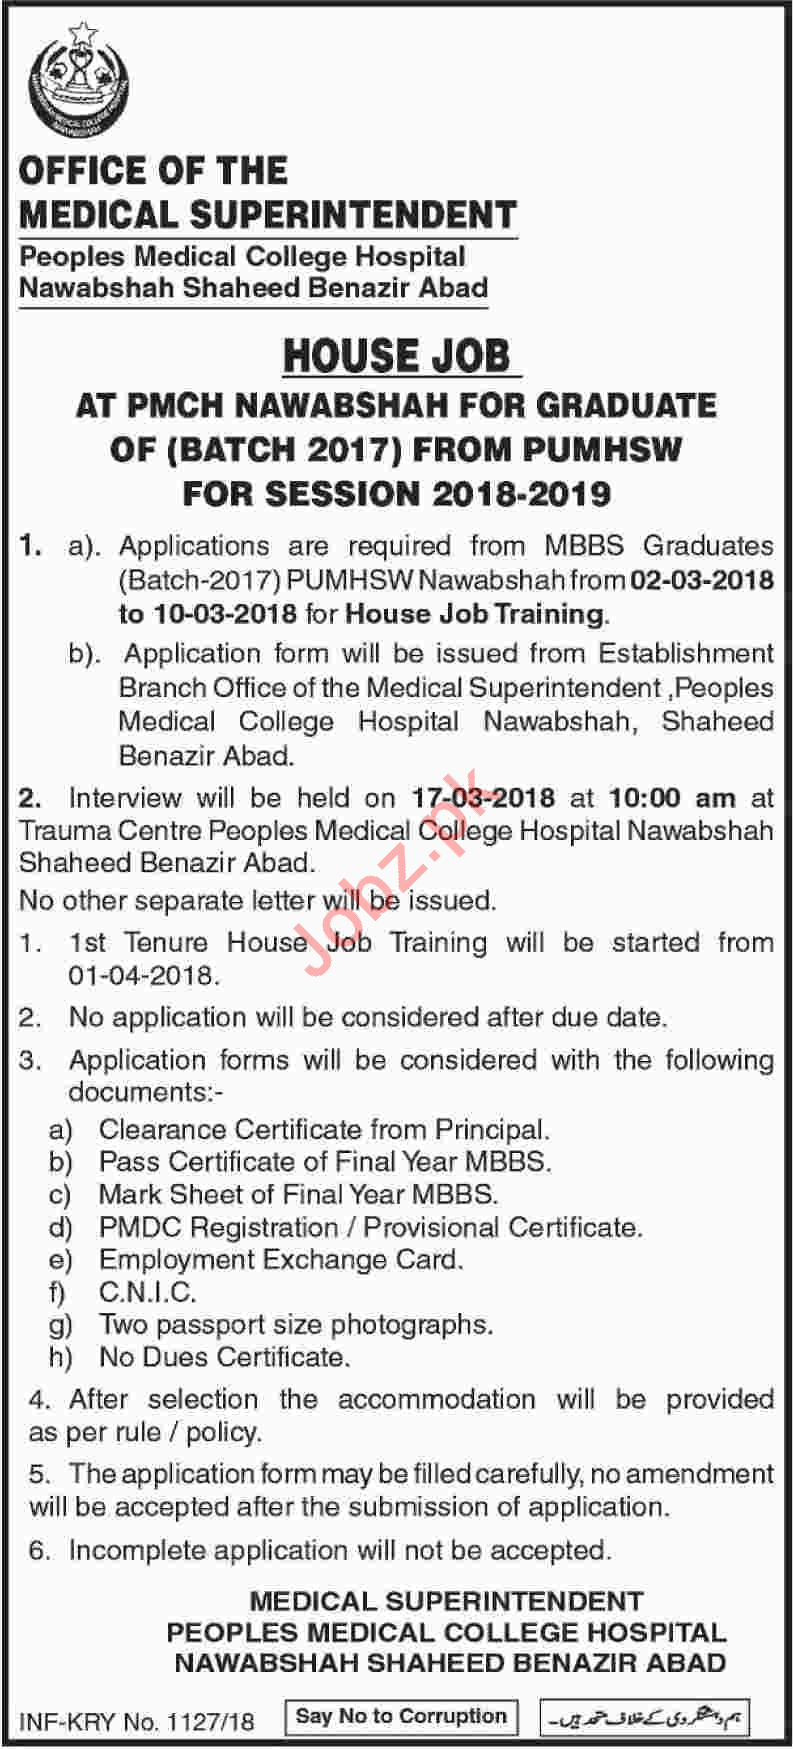 Peoples Medical College Hospital Nawabshah House Jobs 2018